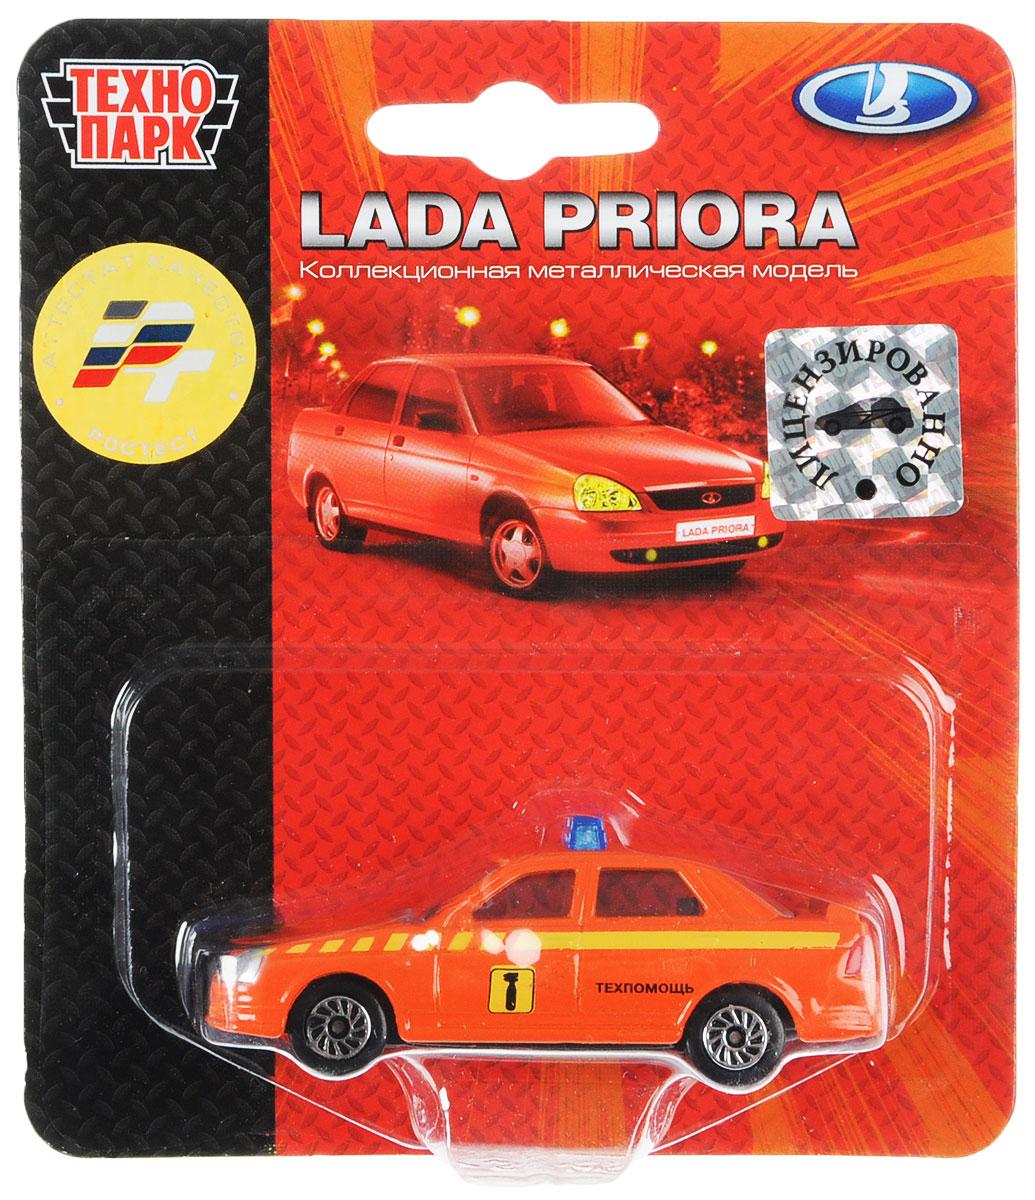 ТехноПарк Автомобиль Lada Priora Техпомощь